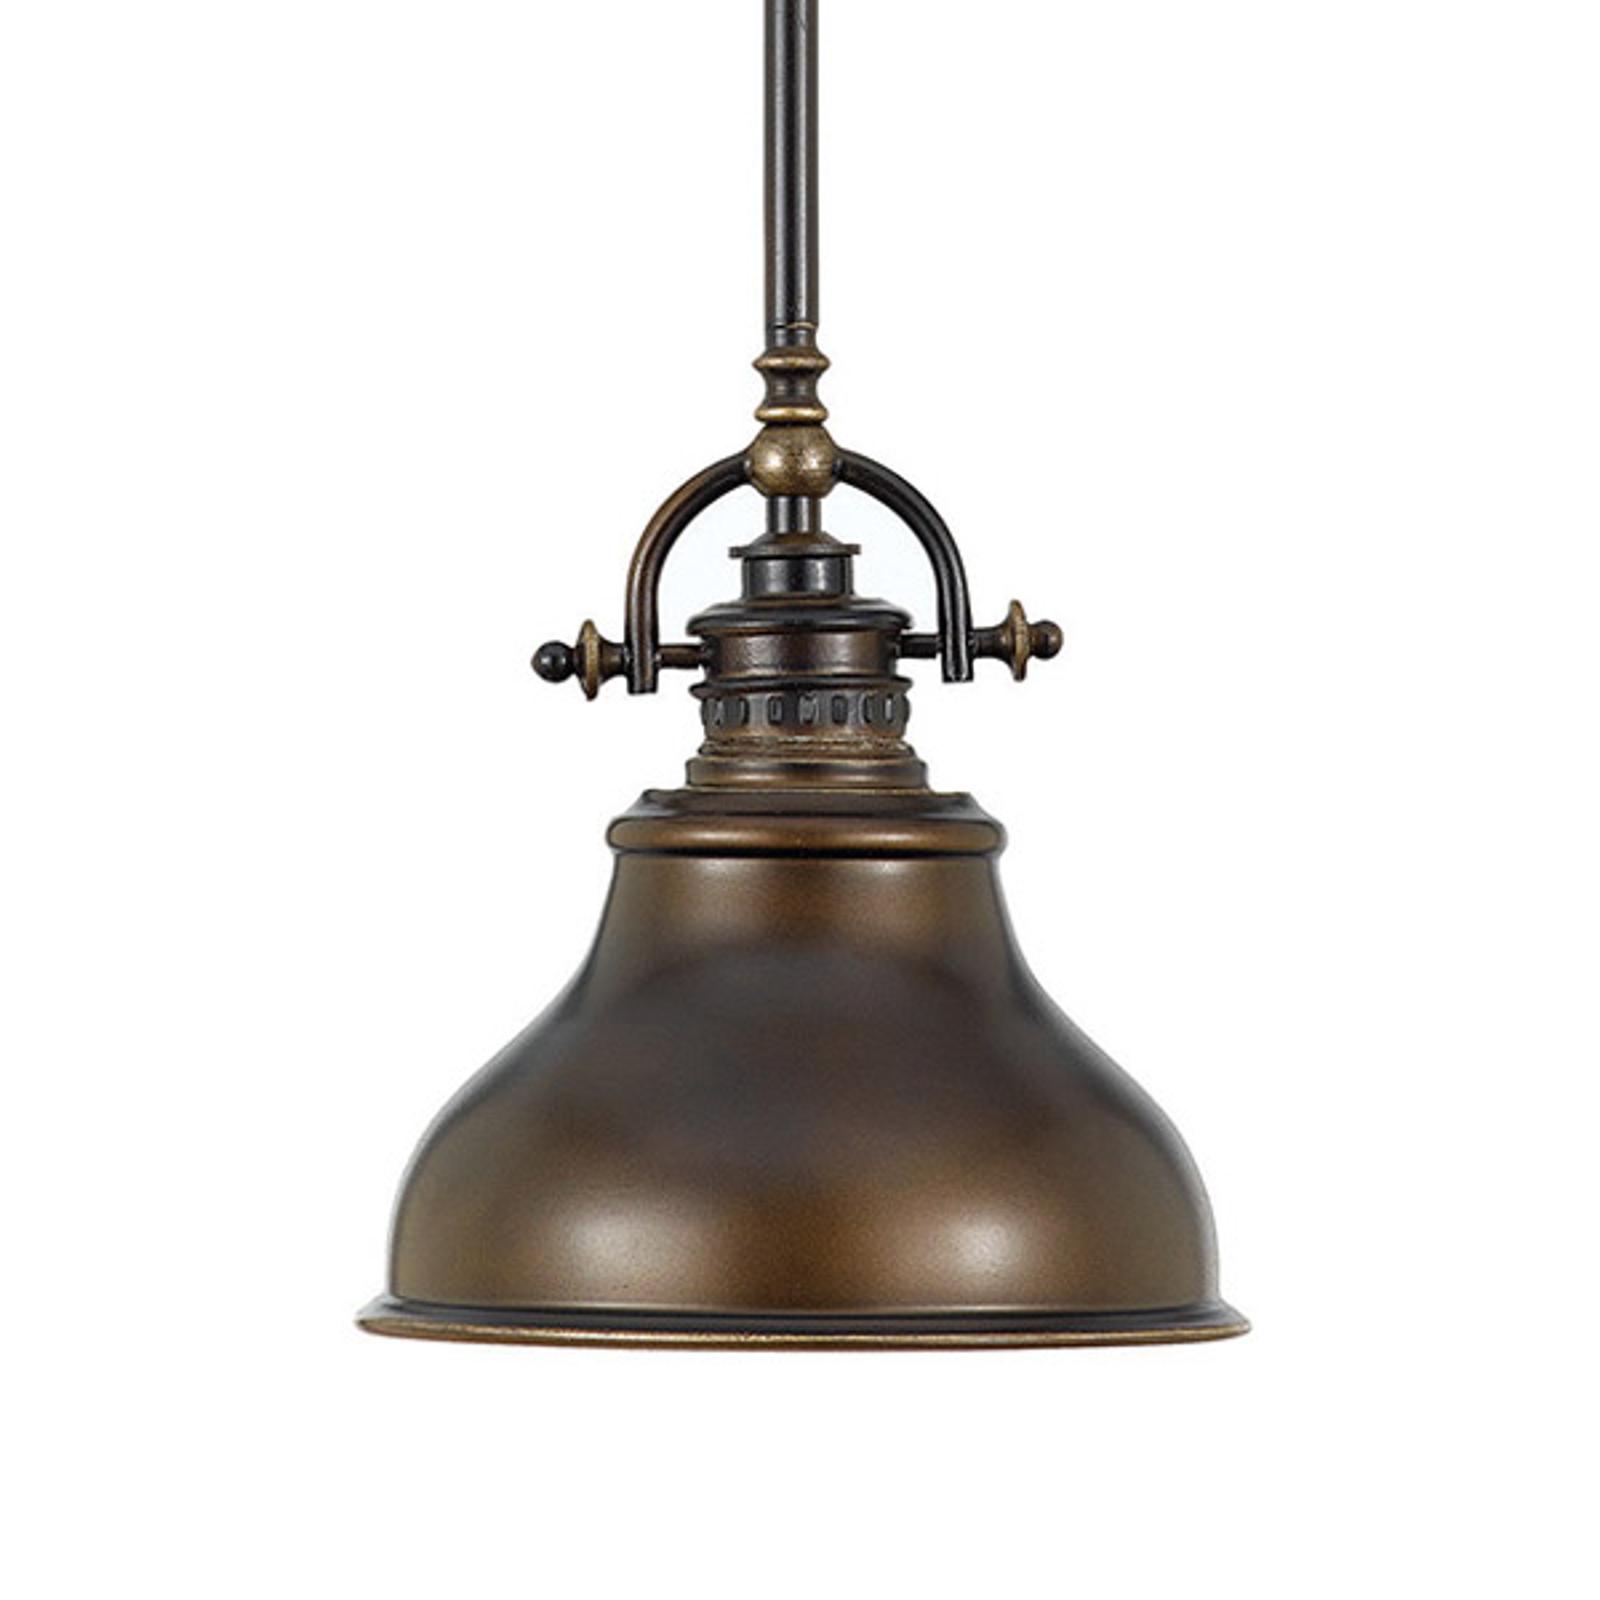 Lampada a sospensione Emery bronzo Ø 20,3 cm